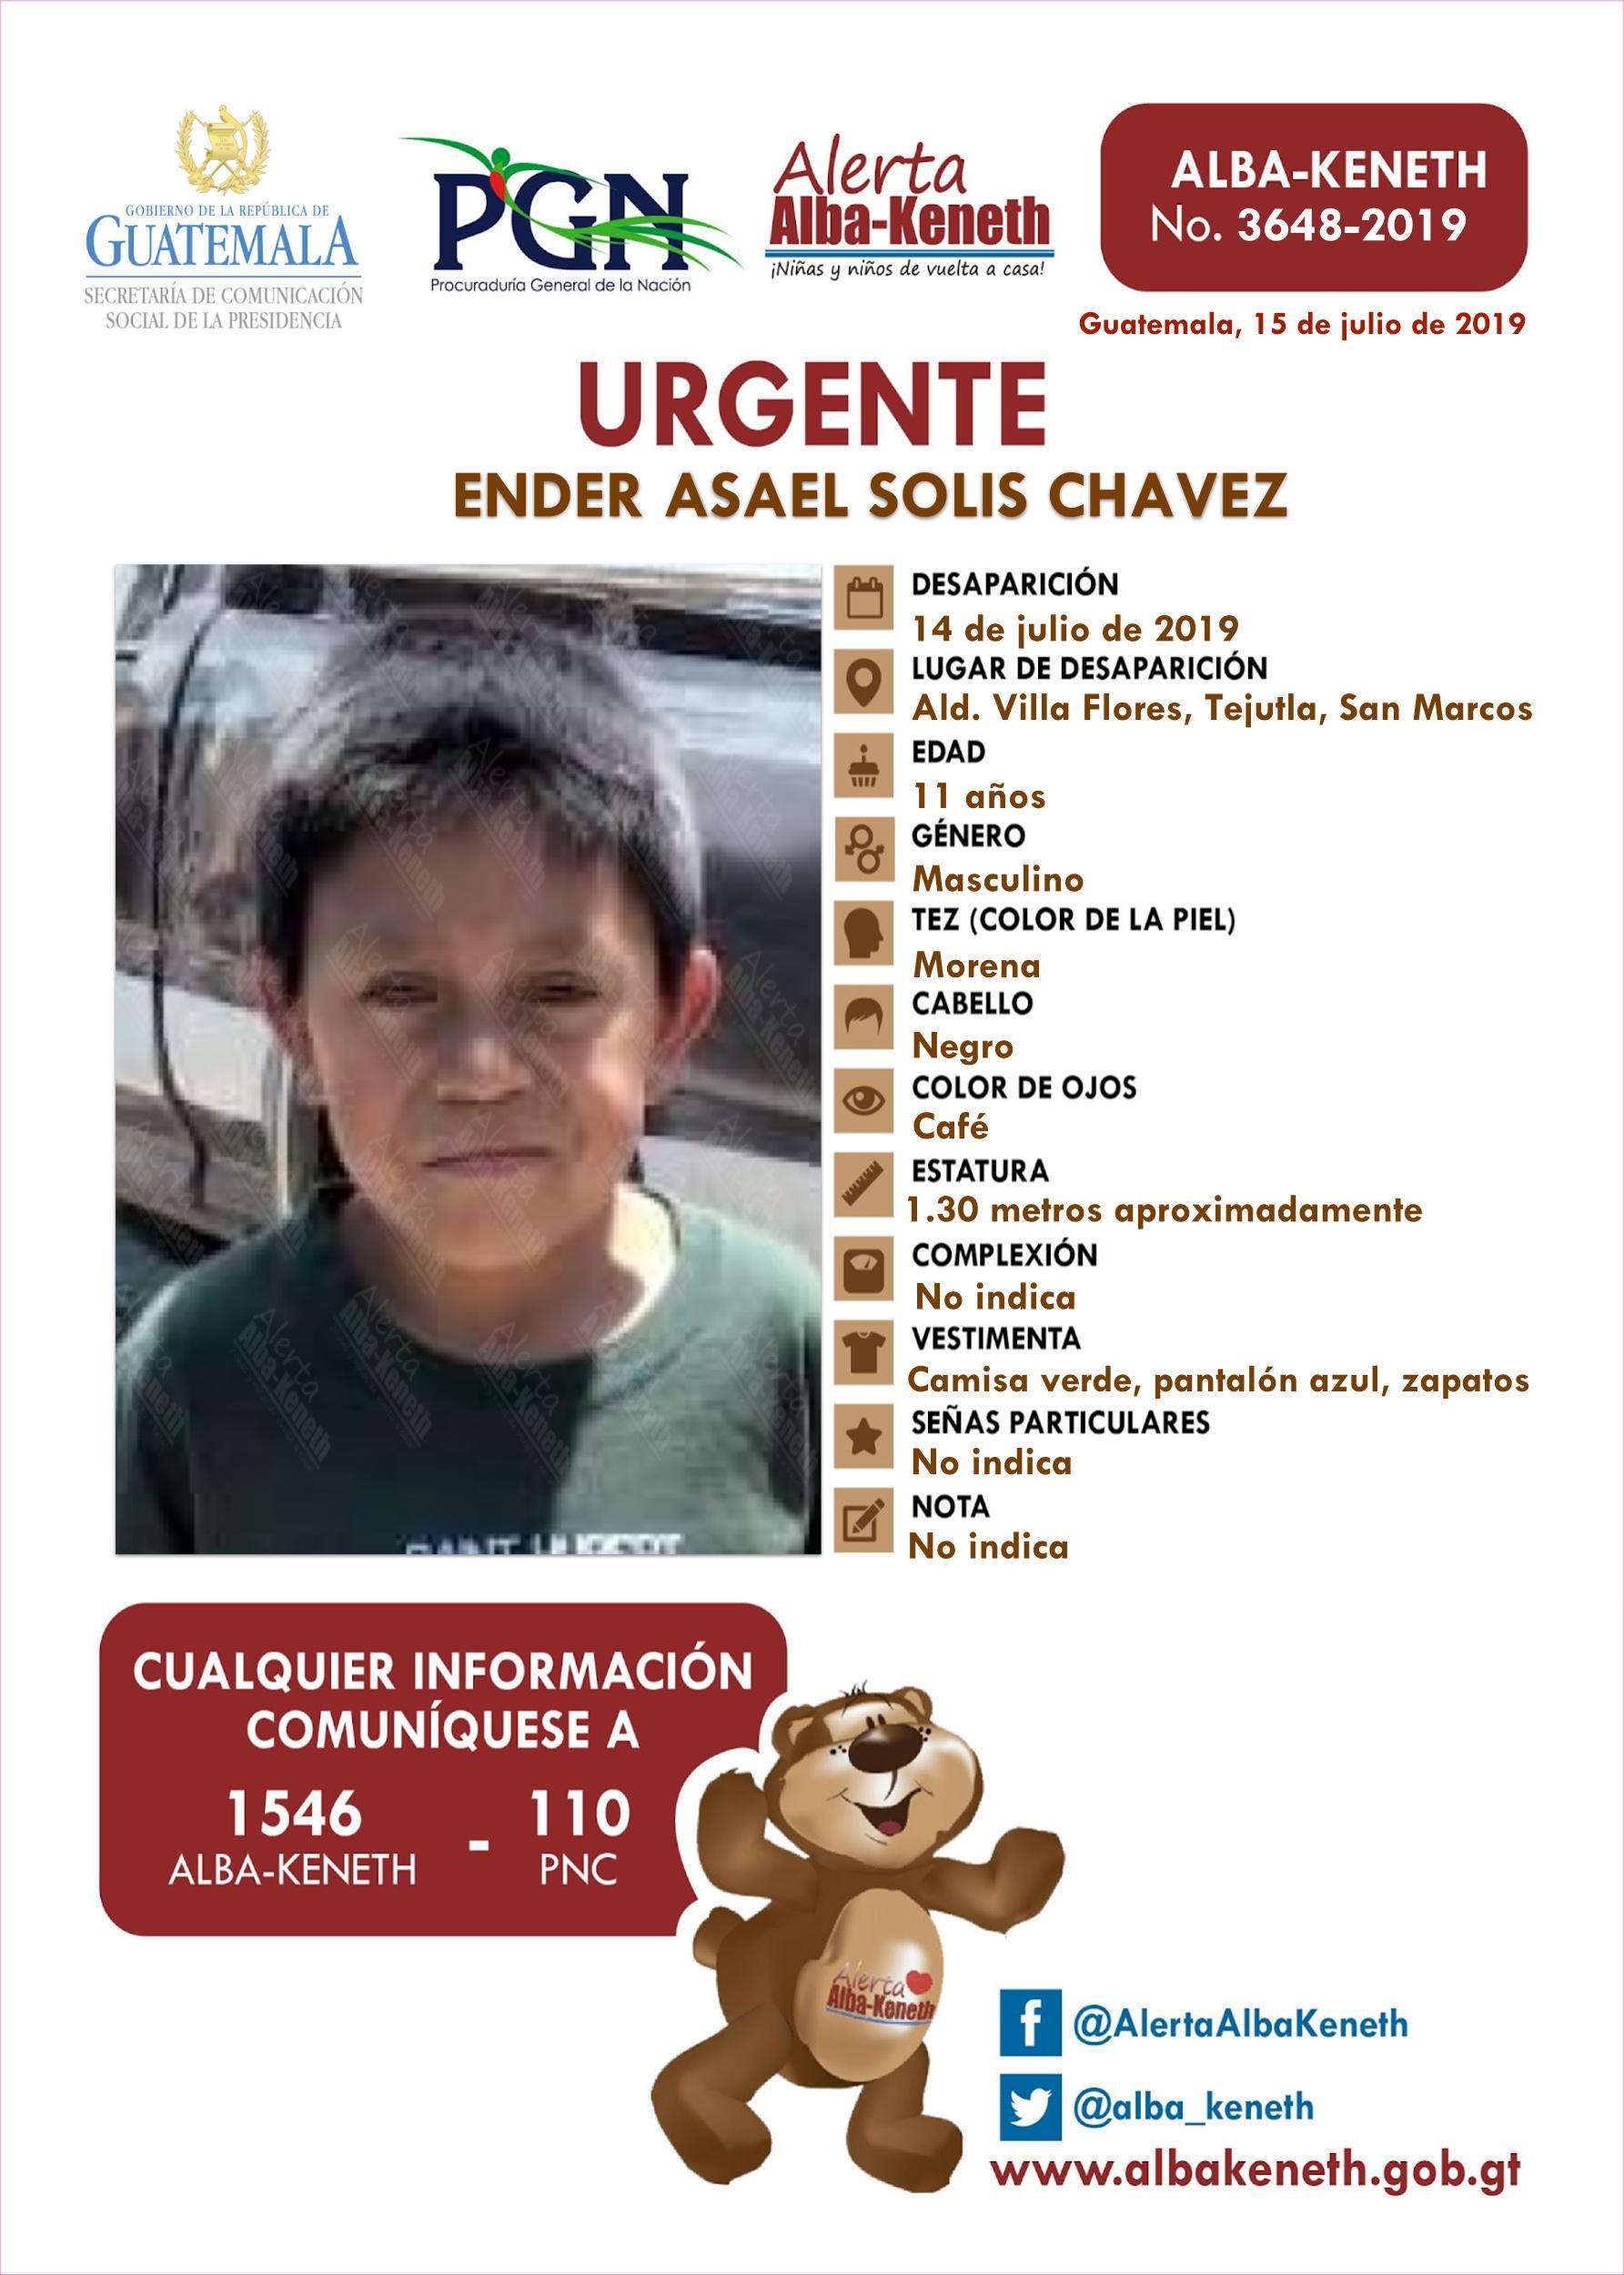 Ender Asael Solis Chavez